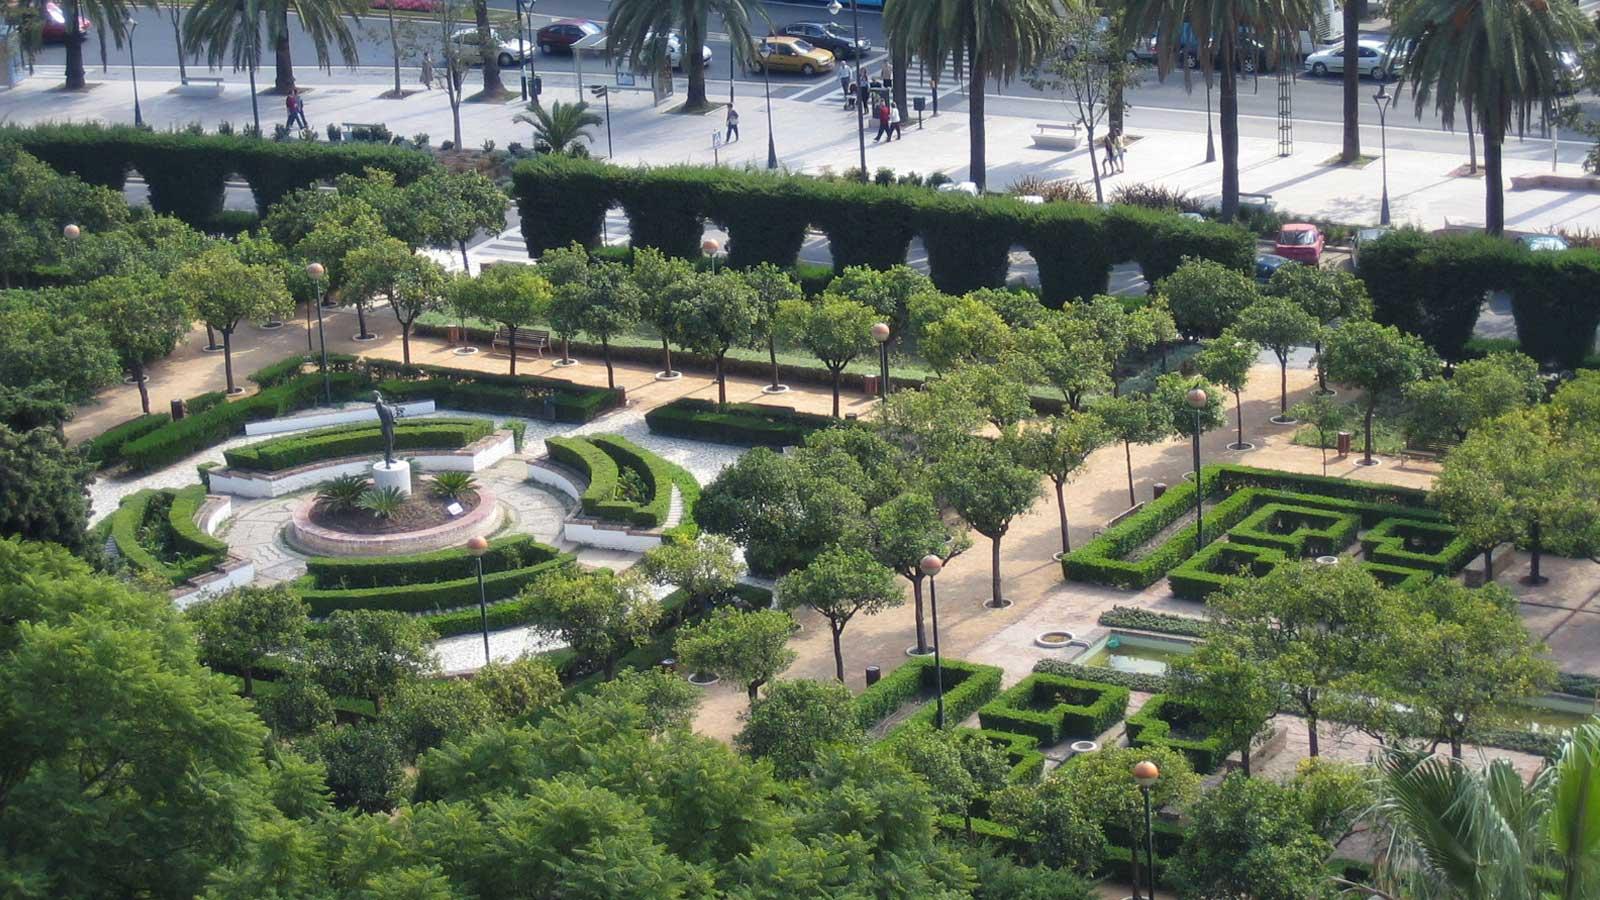 parques jardines y fuentes de m laga patrimonio